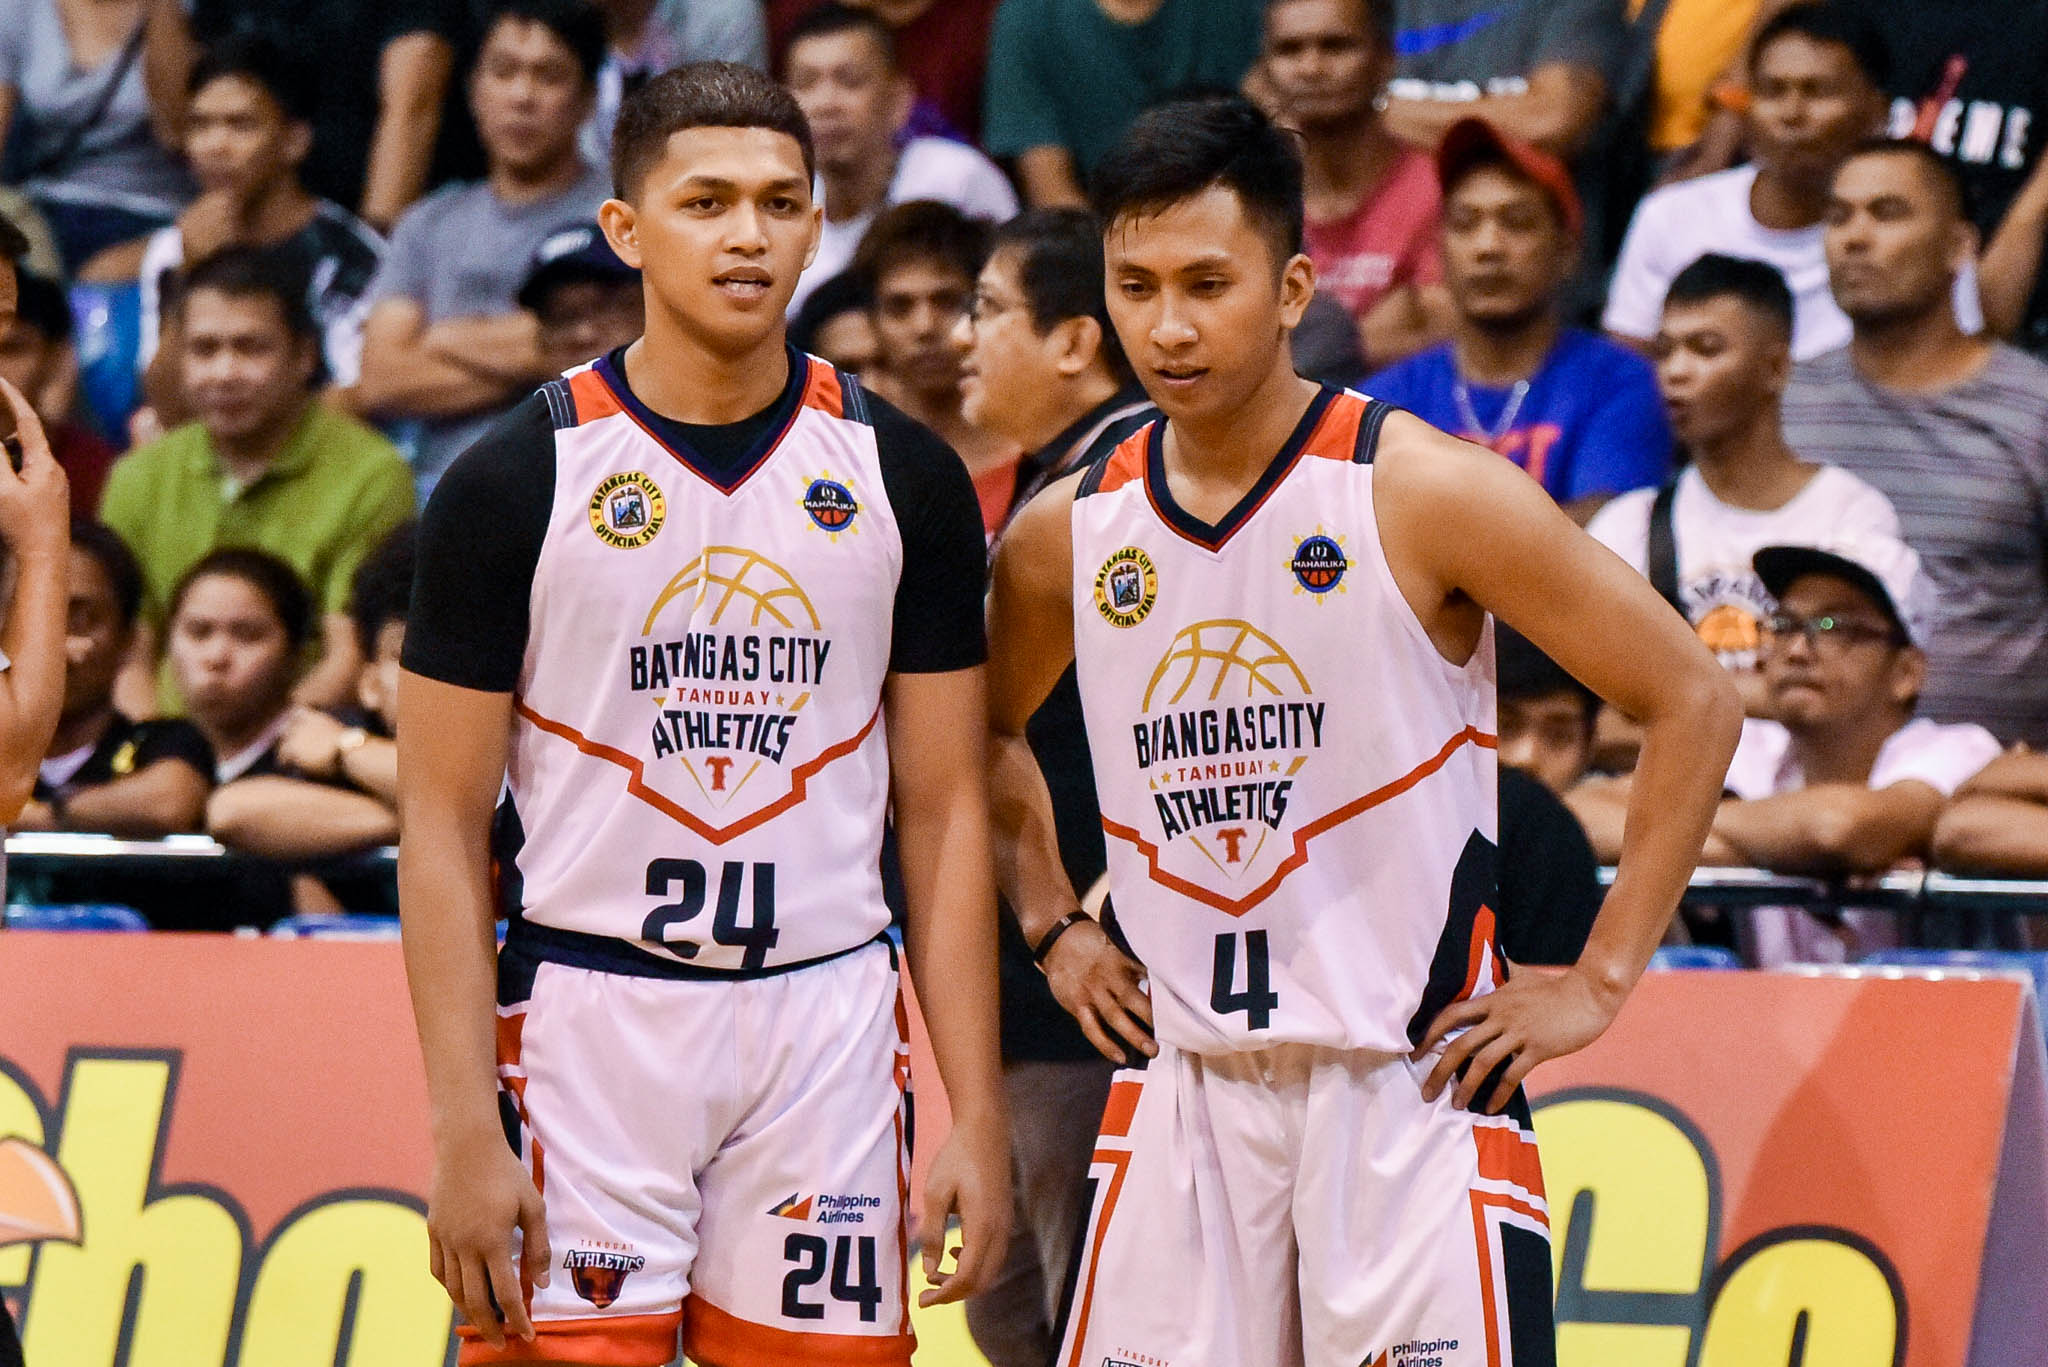 MPBL-2019-2020-Batangas-vs.-Pampanga-6TH-PHOTO-Jaydee-TUNGCAB-REY-SUERTE-BATANAGAS Jaydee Tungcab applies for PBA Draft as B.League dream crushed by COVID-19 Basketball News PBA  - philippine sports news